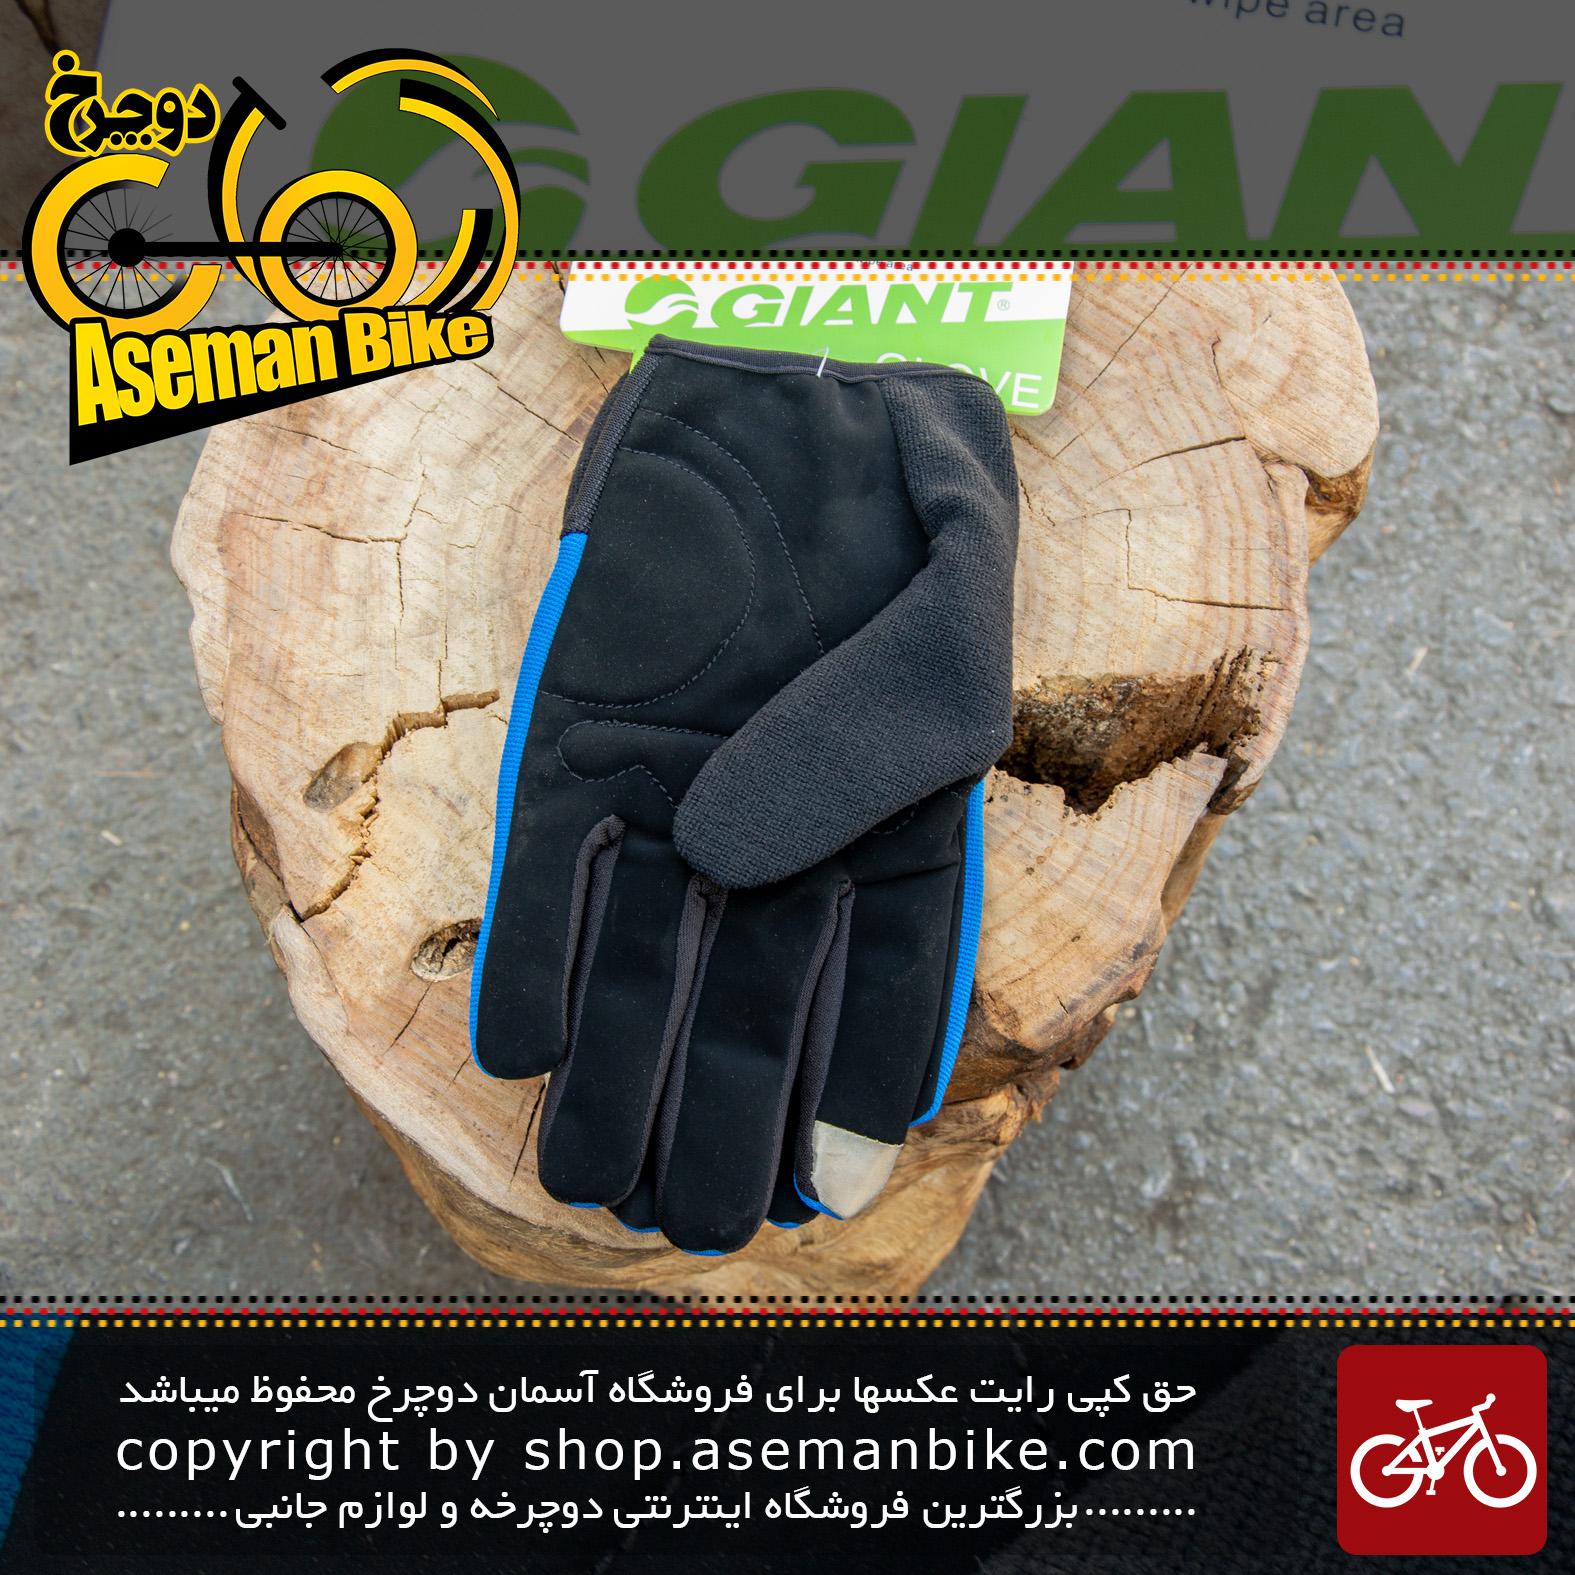 دستکش برند جاینت مدل تمام پنجه Giant Glove